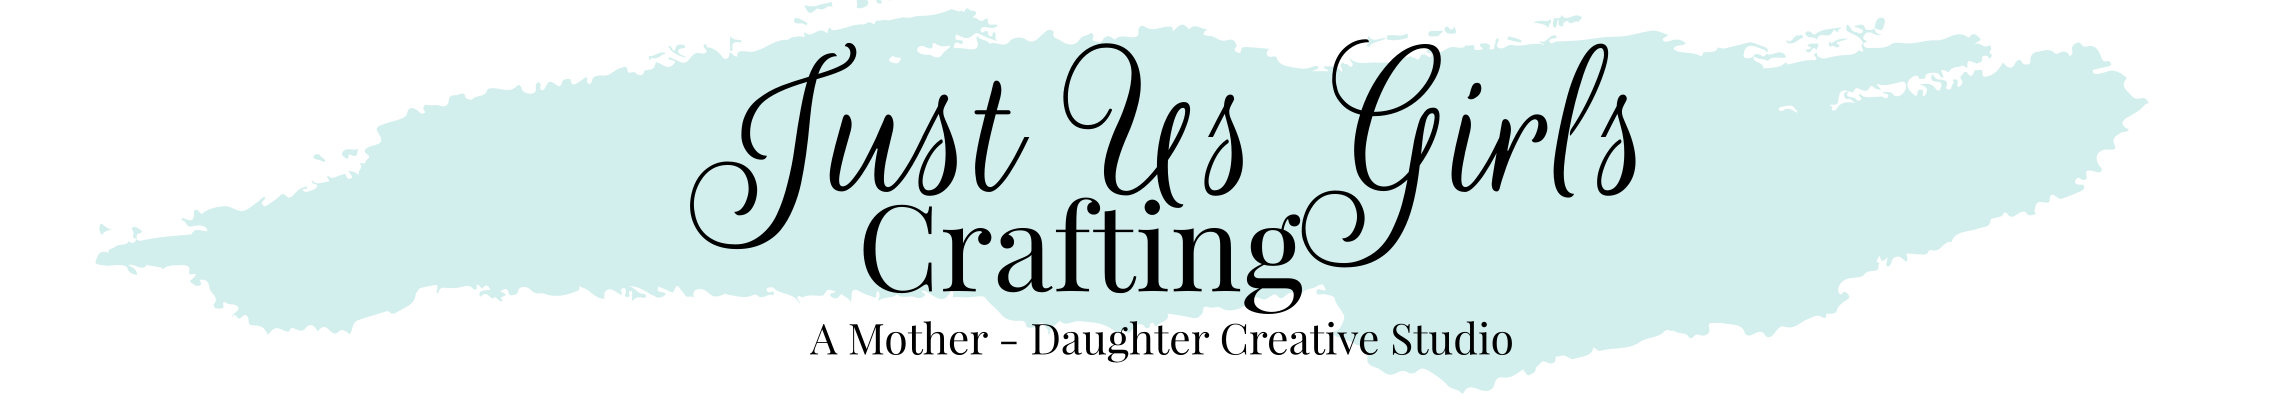 Just Us Girls Crafting